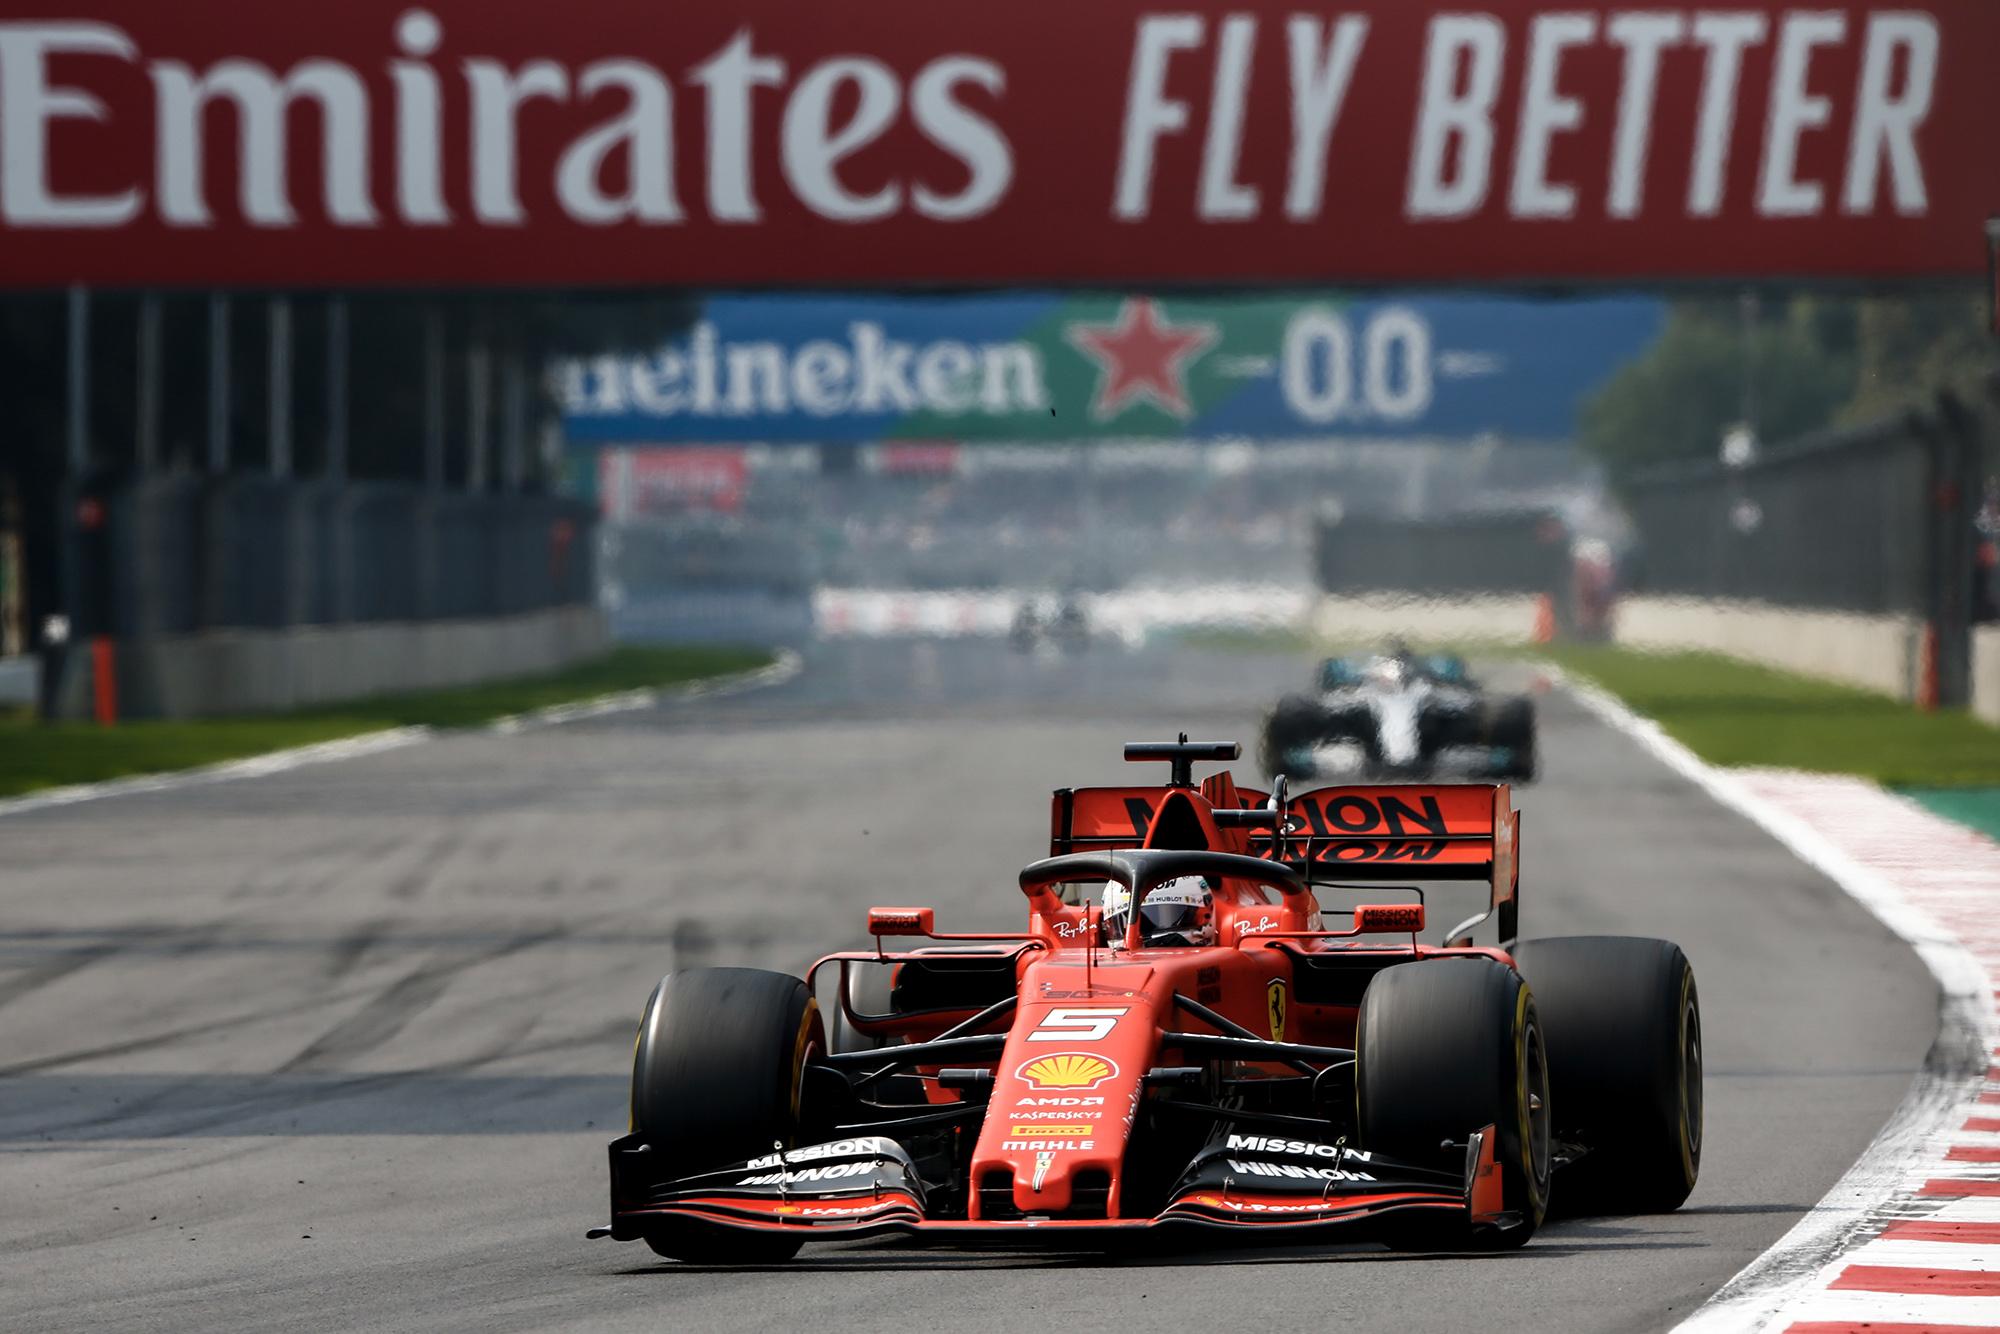 Sebastian Vettel leads Lewis Hamilton during the 2019 F1 Mexican Grand Prix